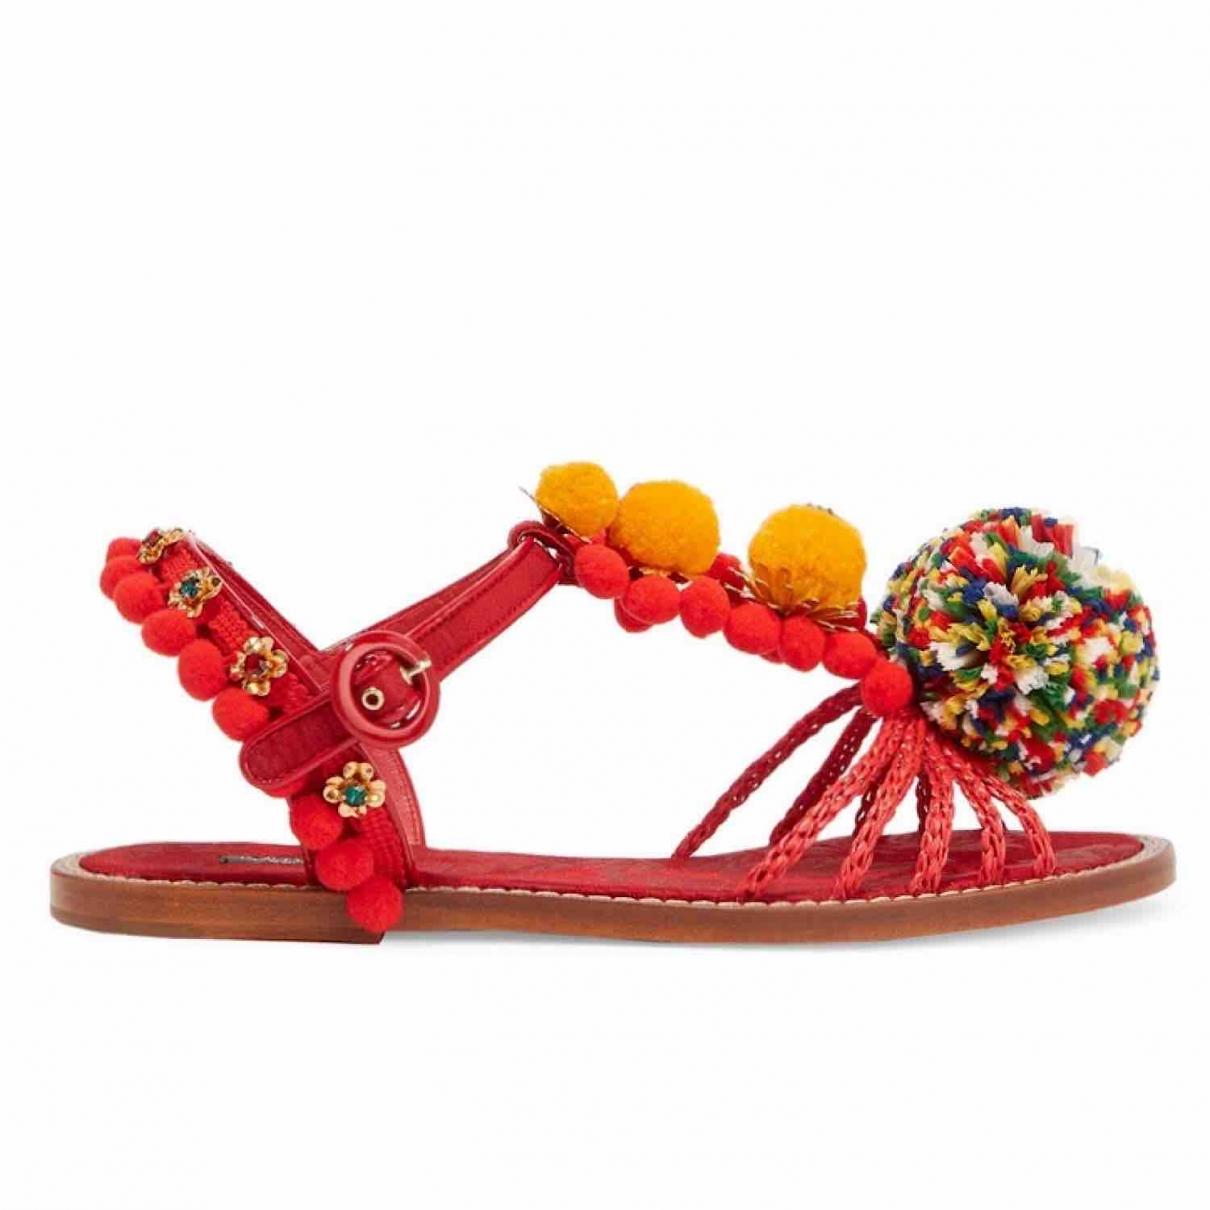 Dolce & Gabbana \N Multicolour Leather Sandals for Women 38 EU